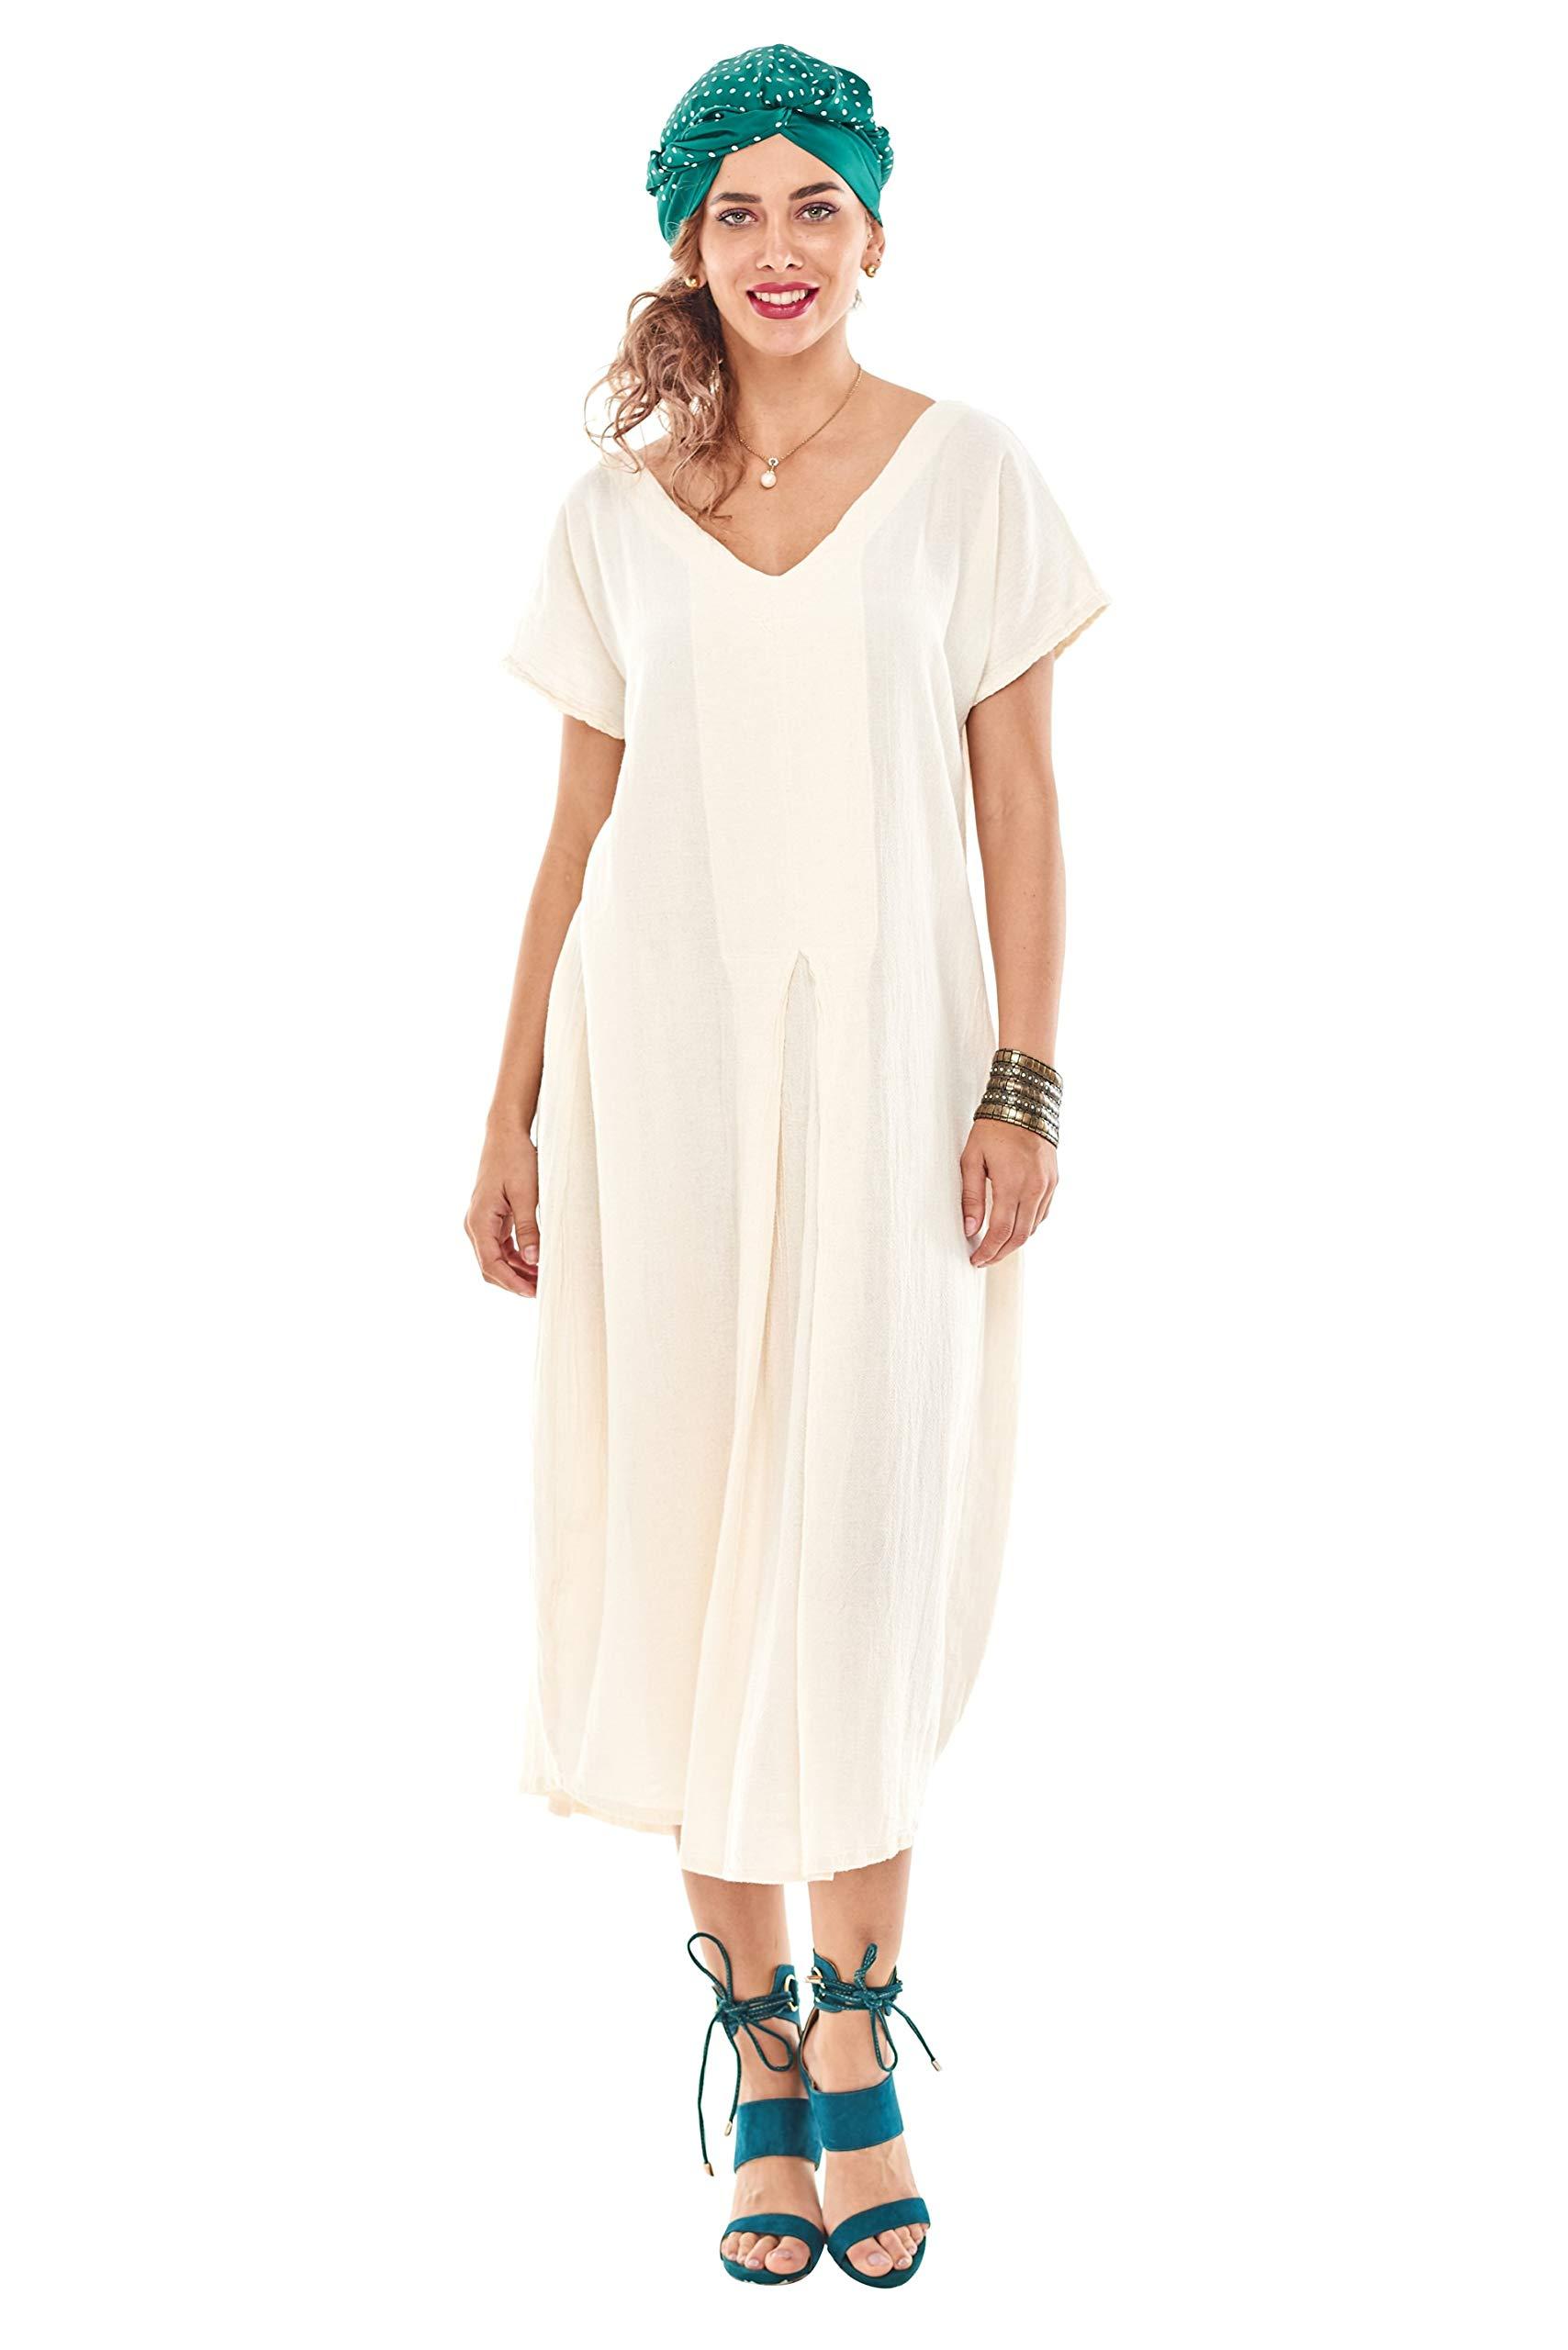 Available at Amazon: Oh My Gauze Women's Natalie Dress